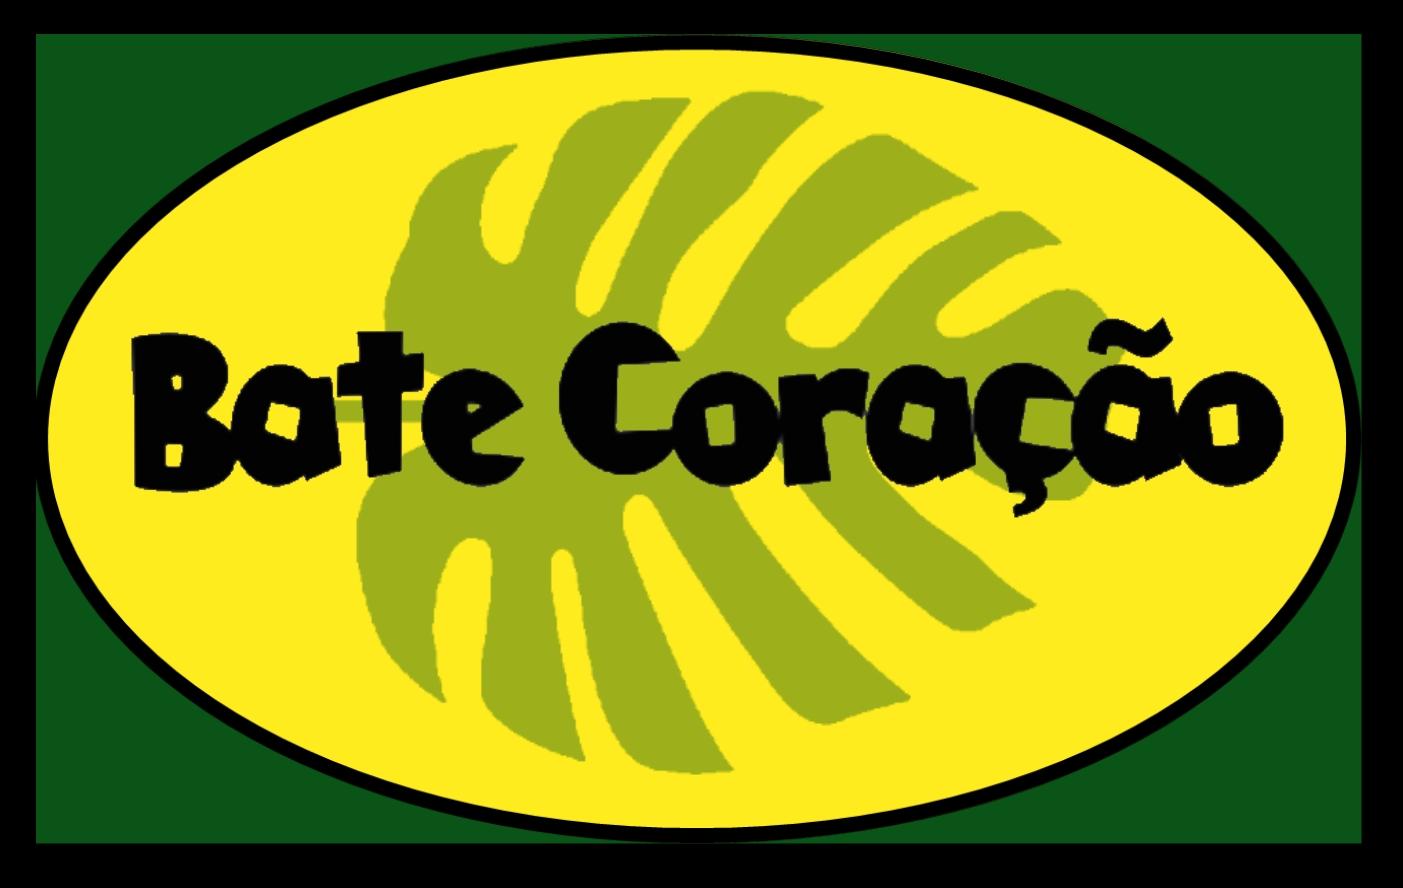 Illustration - ACT, concert, Bate Coraçao, vendredi 23 juillet 2021